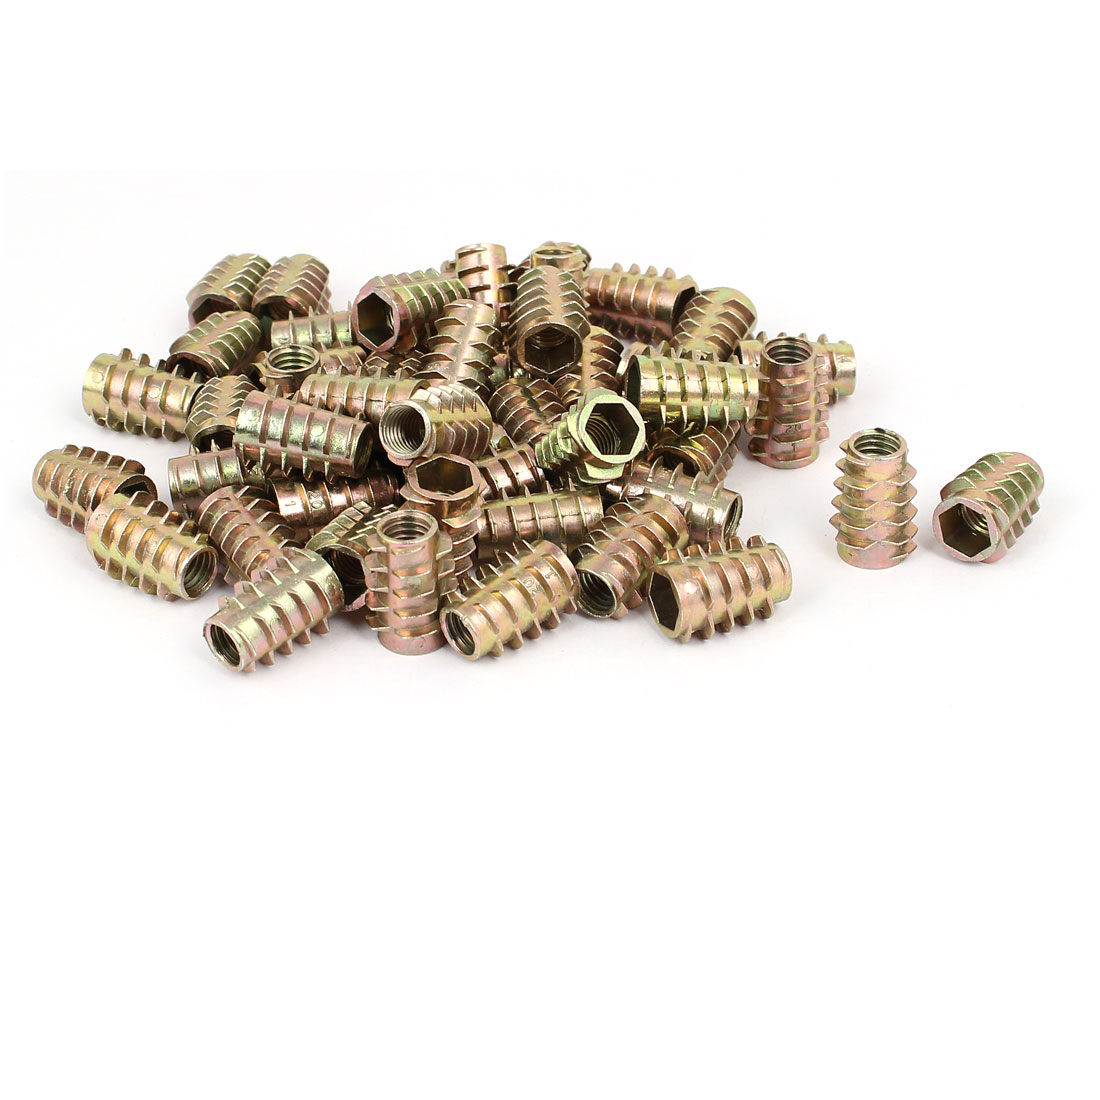 Wood Furniture Zinc Alloy Hex Socket Insert Screws E-Nuts M8x20mm 50pcs